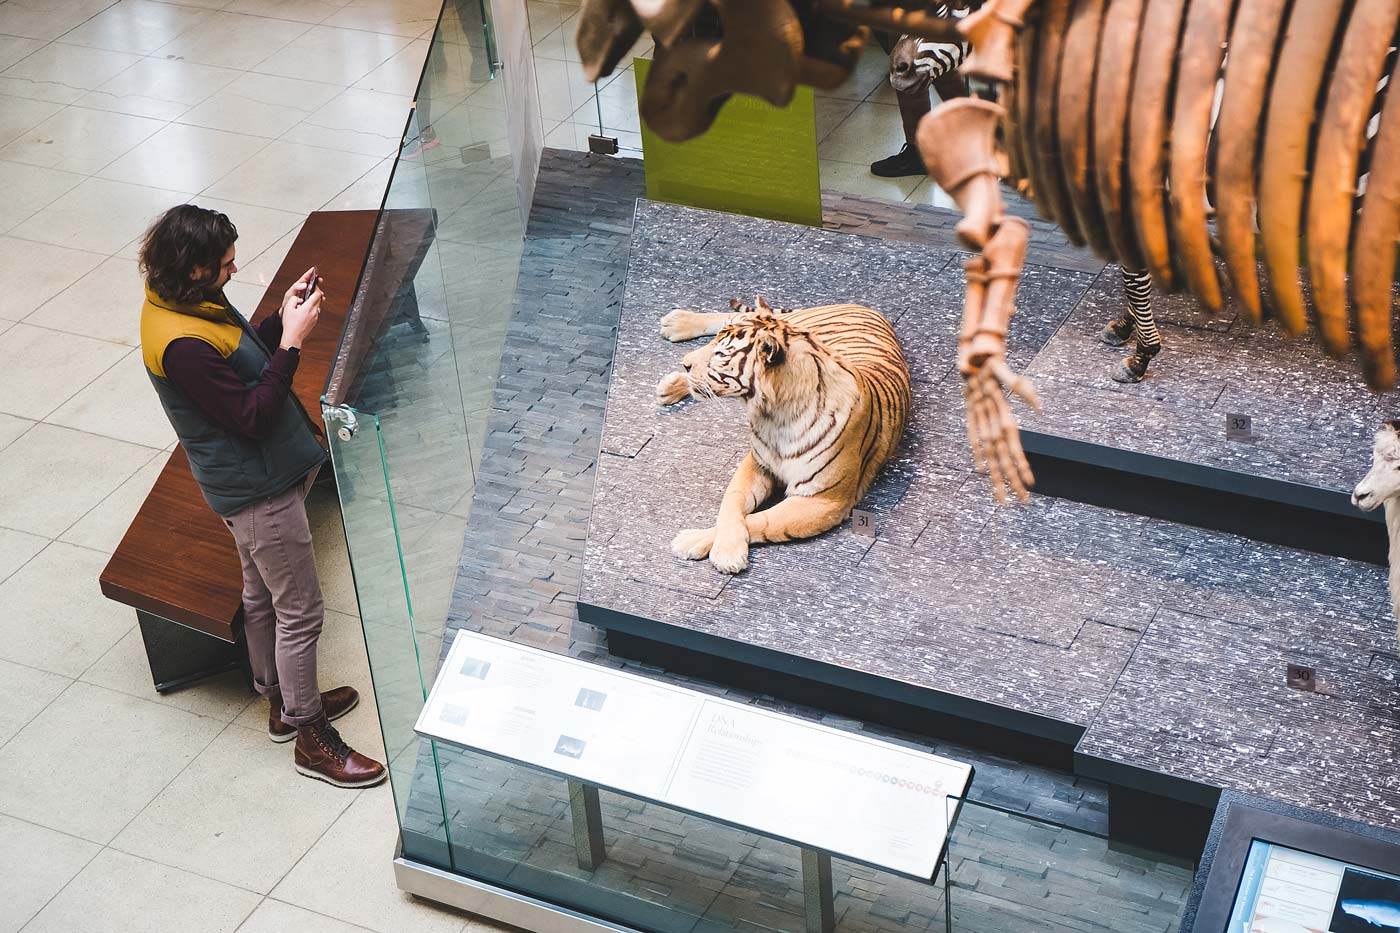 sNatural-History-Museum---Feb-2017-104.jpg